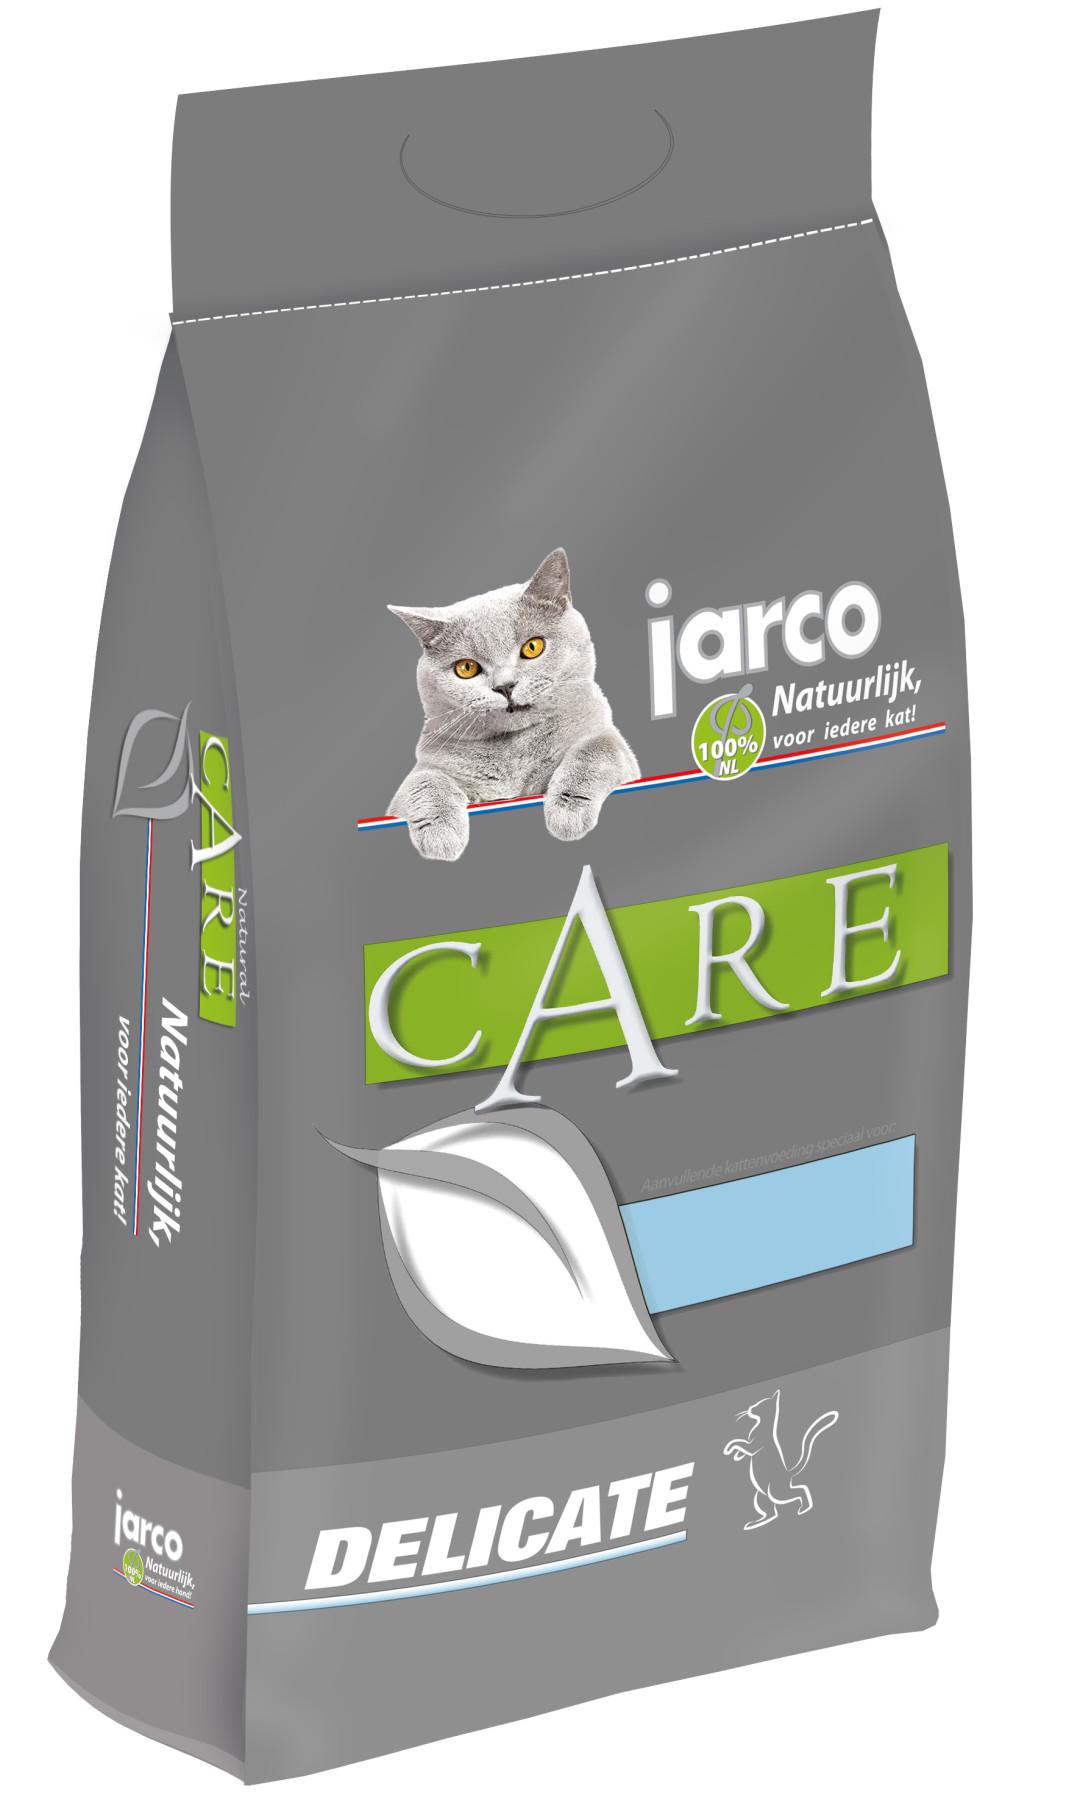 Jarco kattenvoer Natural Delicate Kip/Kalkoen 6 kg